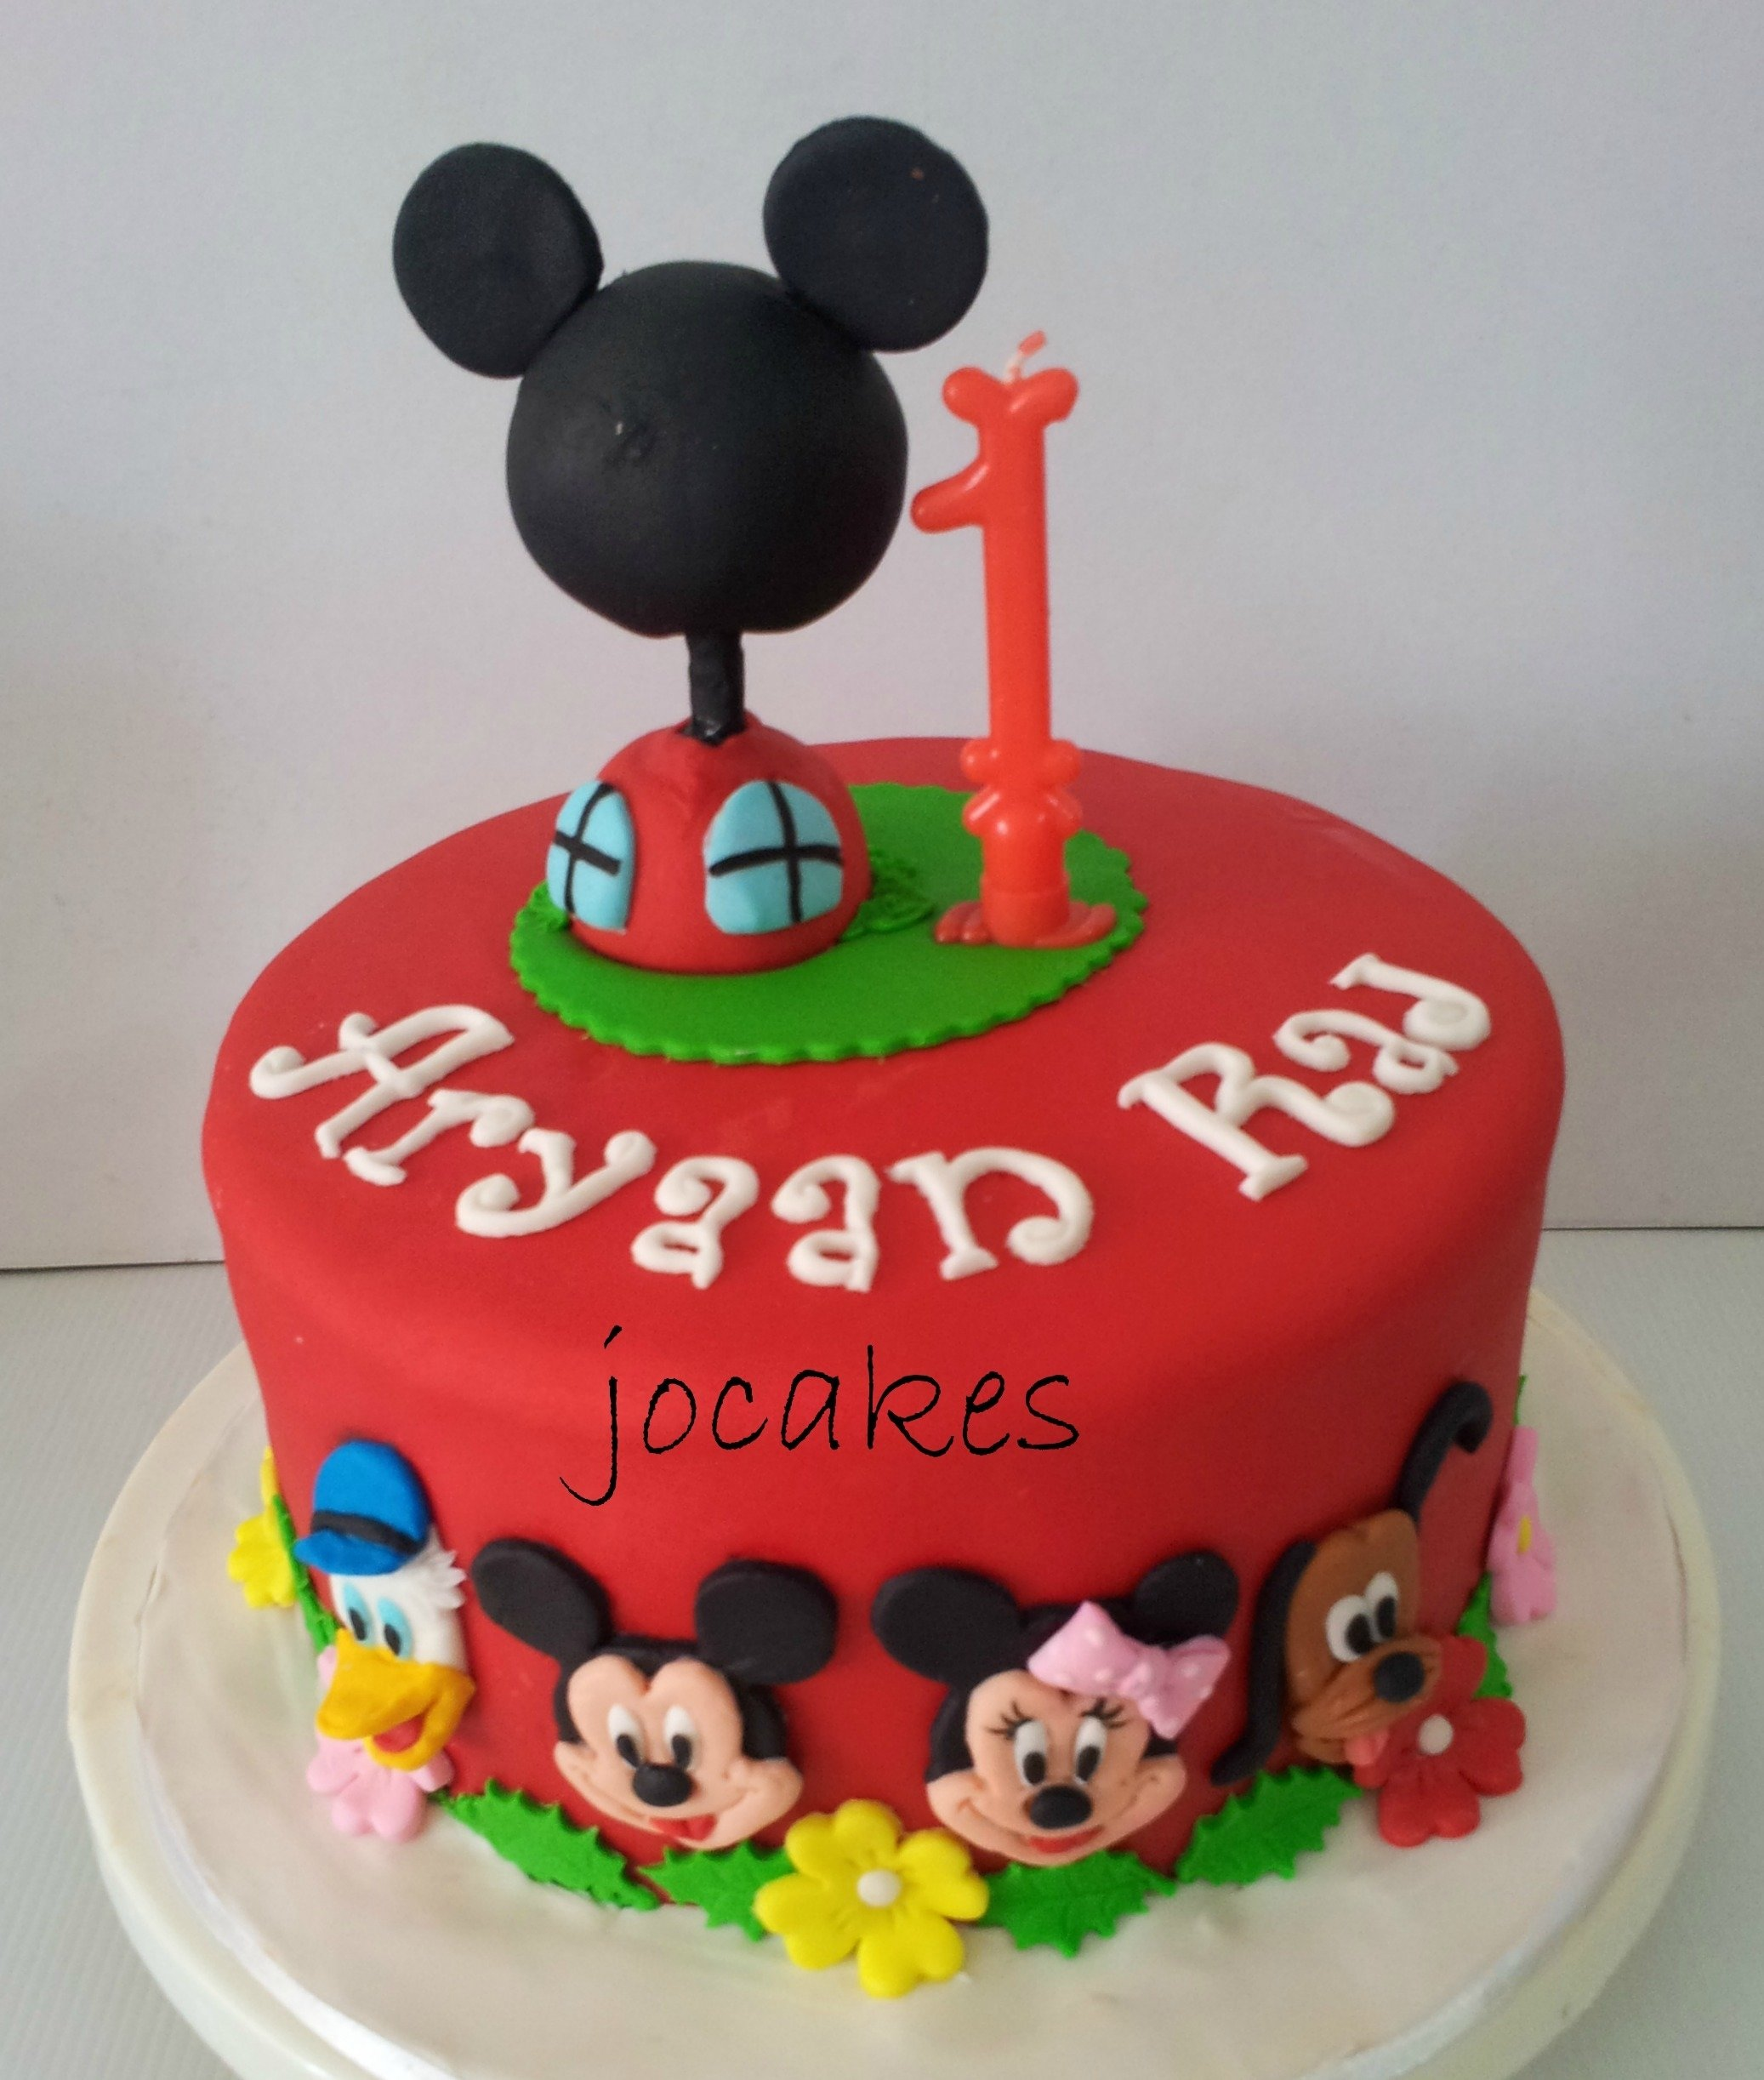 10 Great 4 Year Old Birthday Cake Ideas birthday cakes images 1 year old birthday cake for your baby 1 year